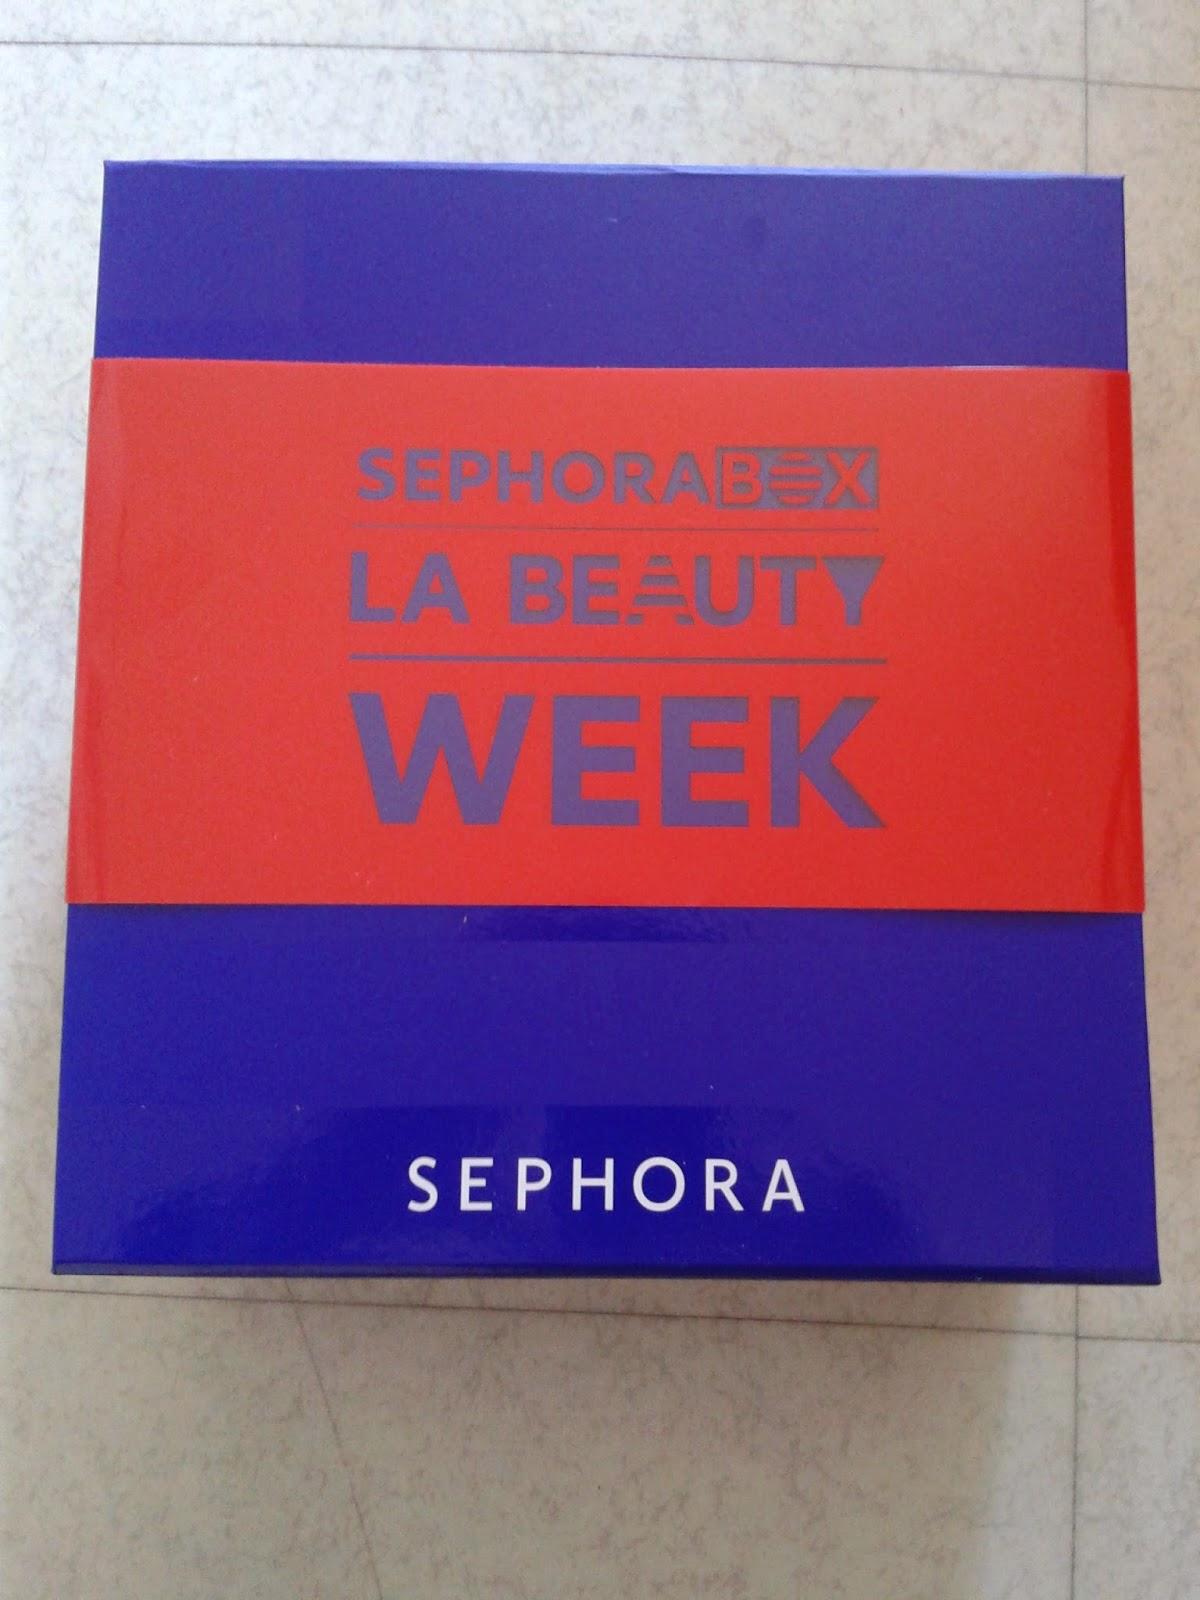 Petite BeautéLa Commandés Plume De Ma BoxProduits Sephora 0wmNnPyvO8